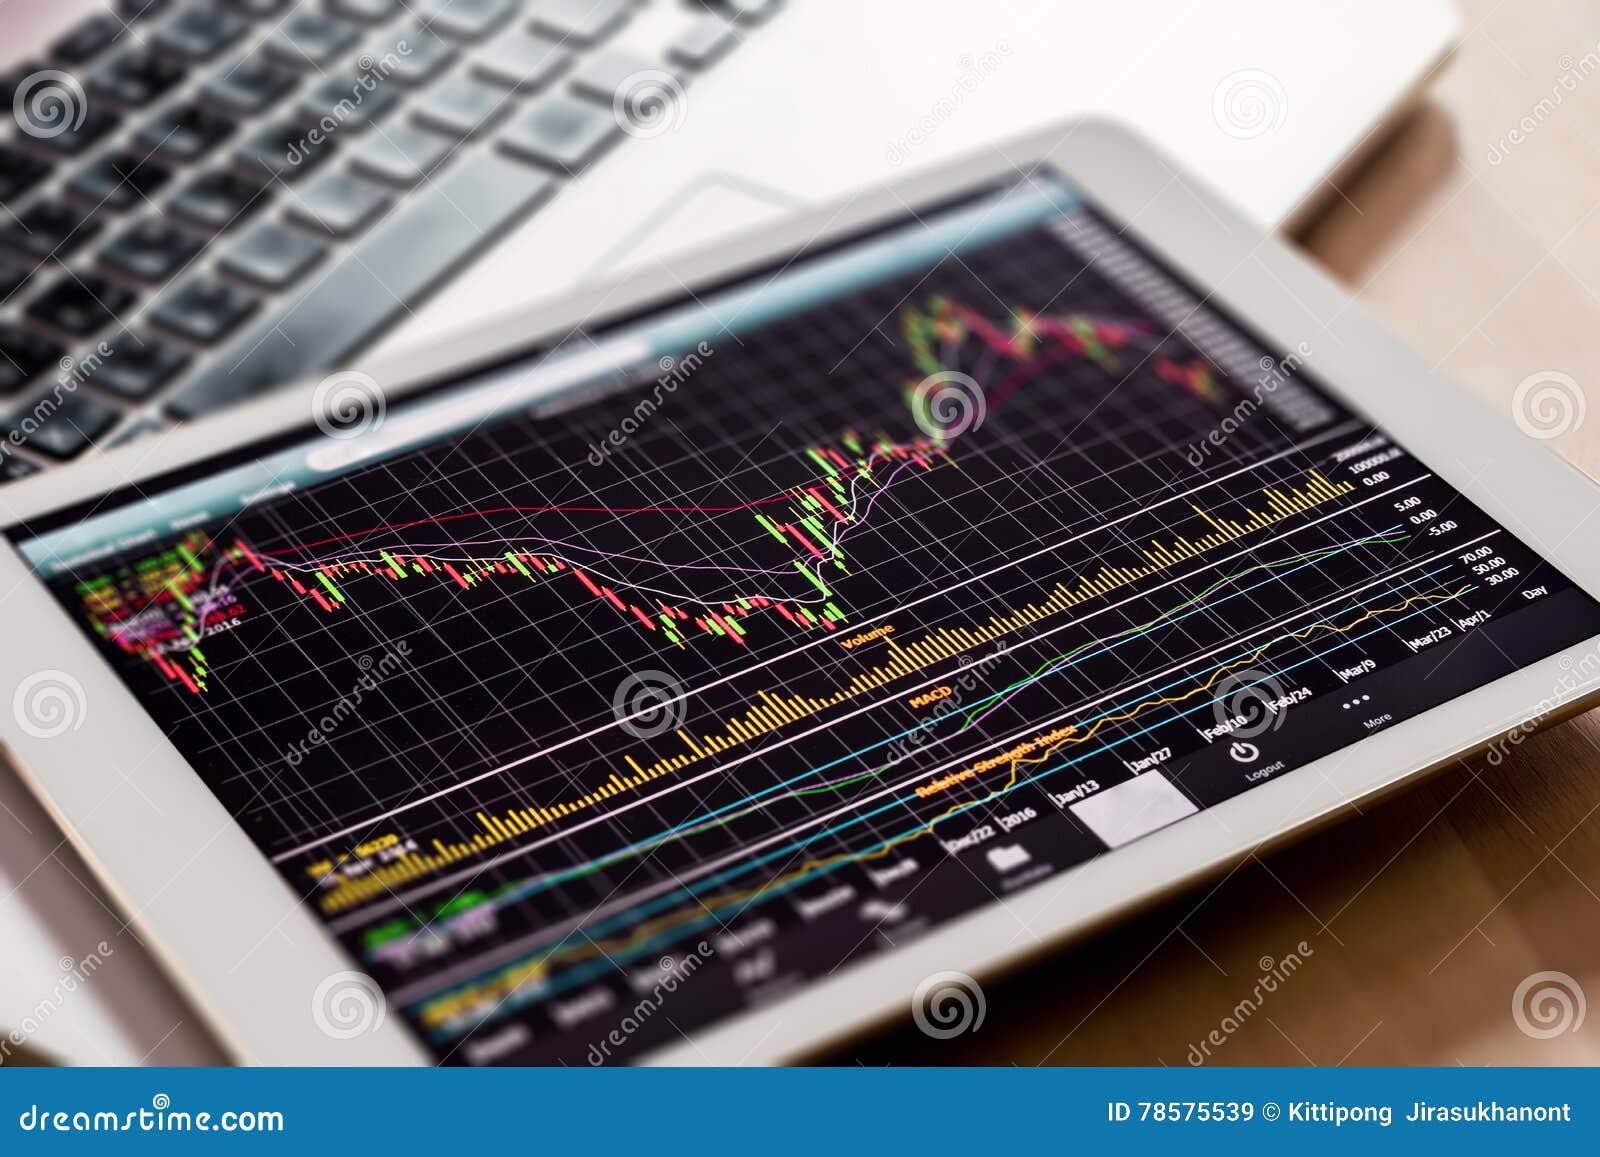 Stock market watching